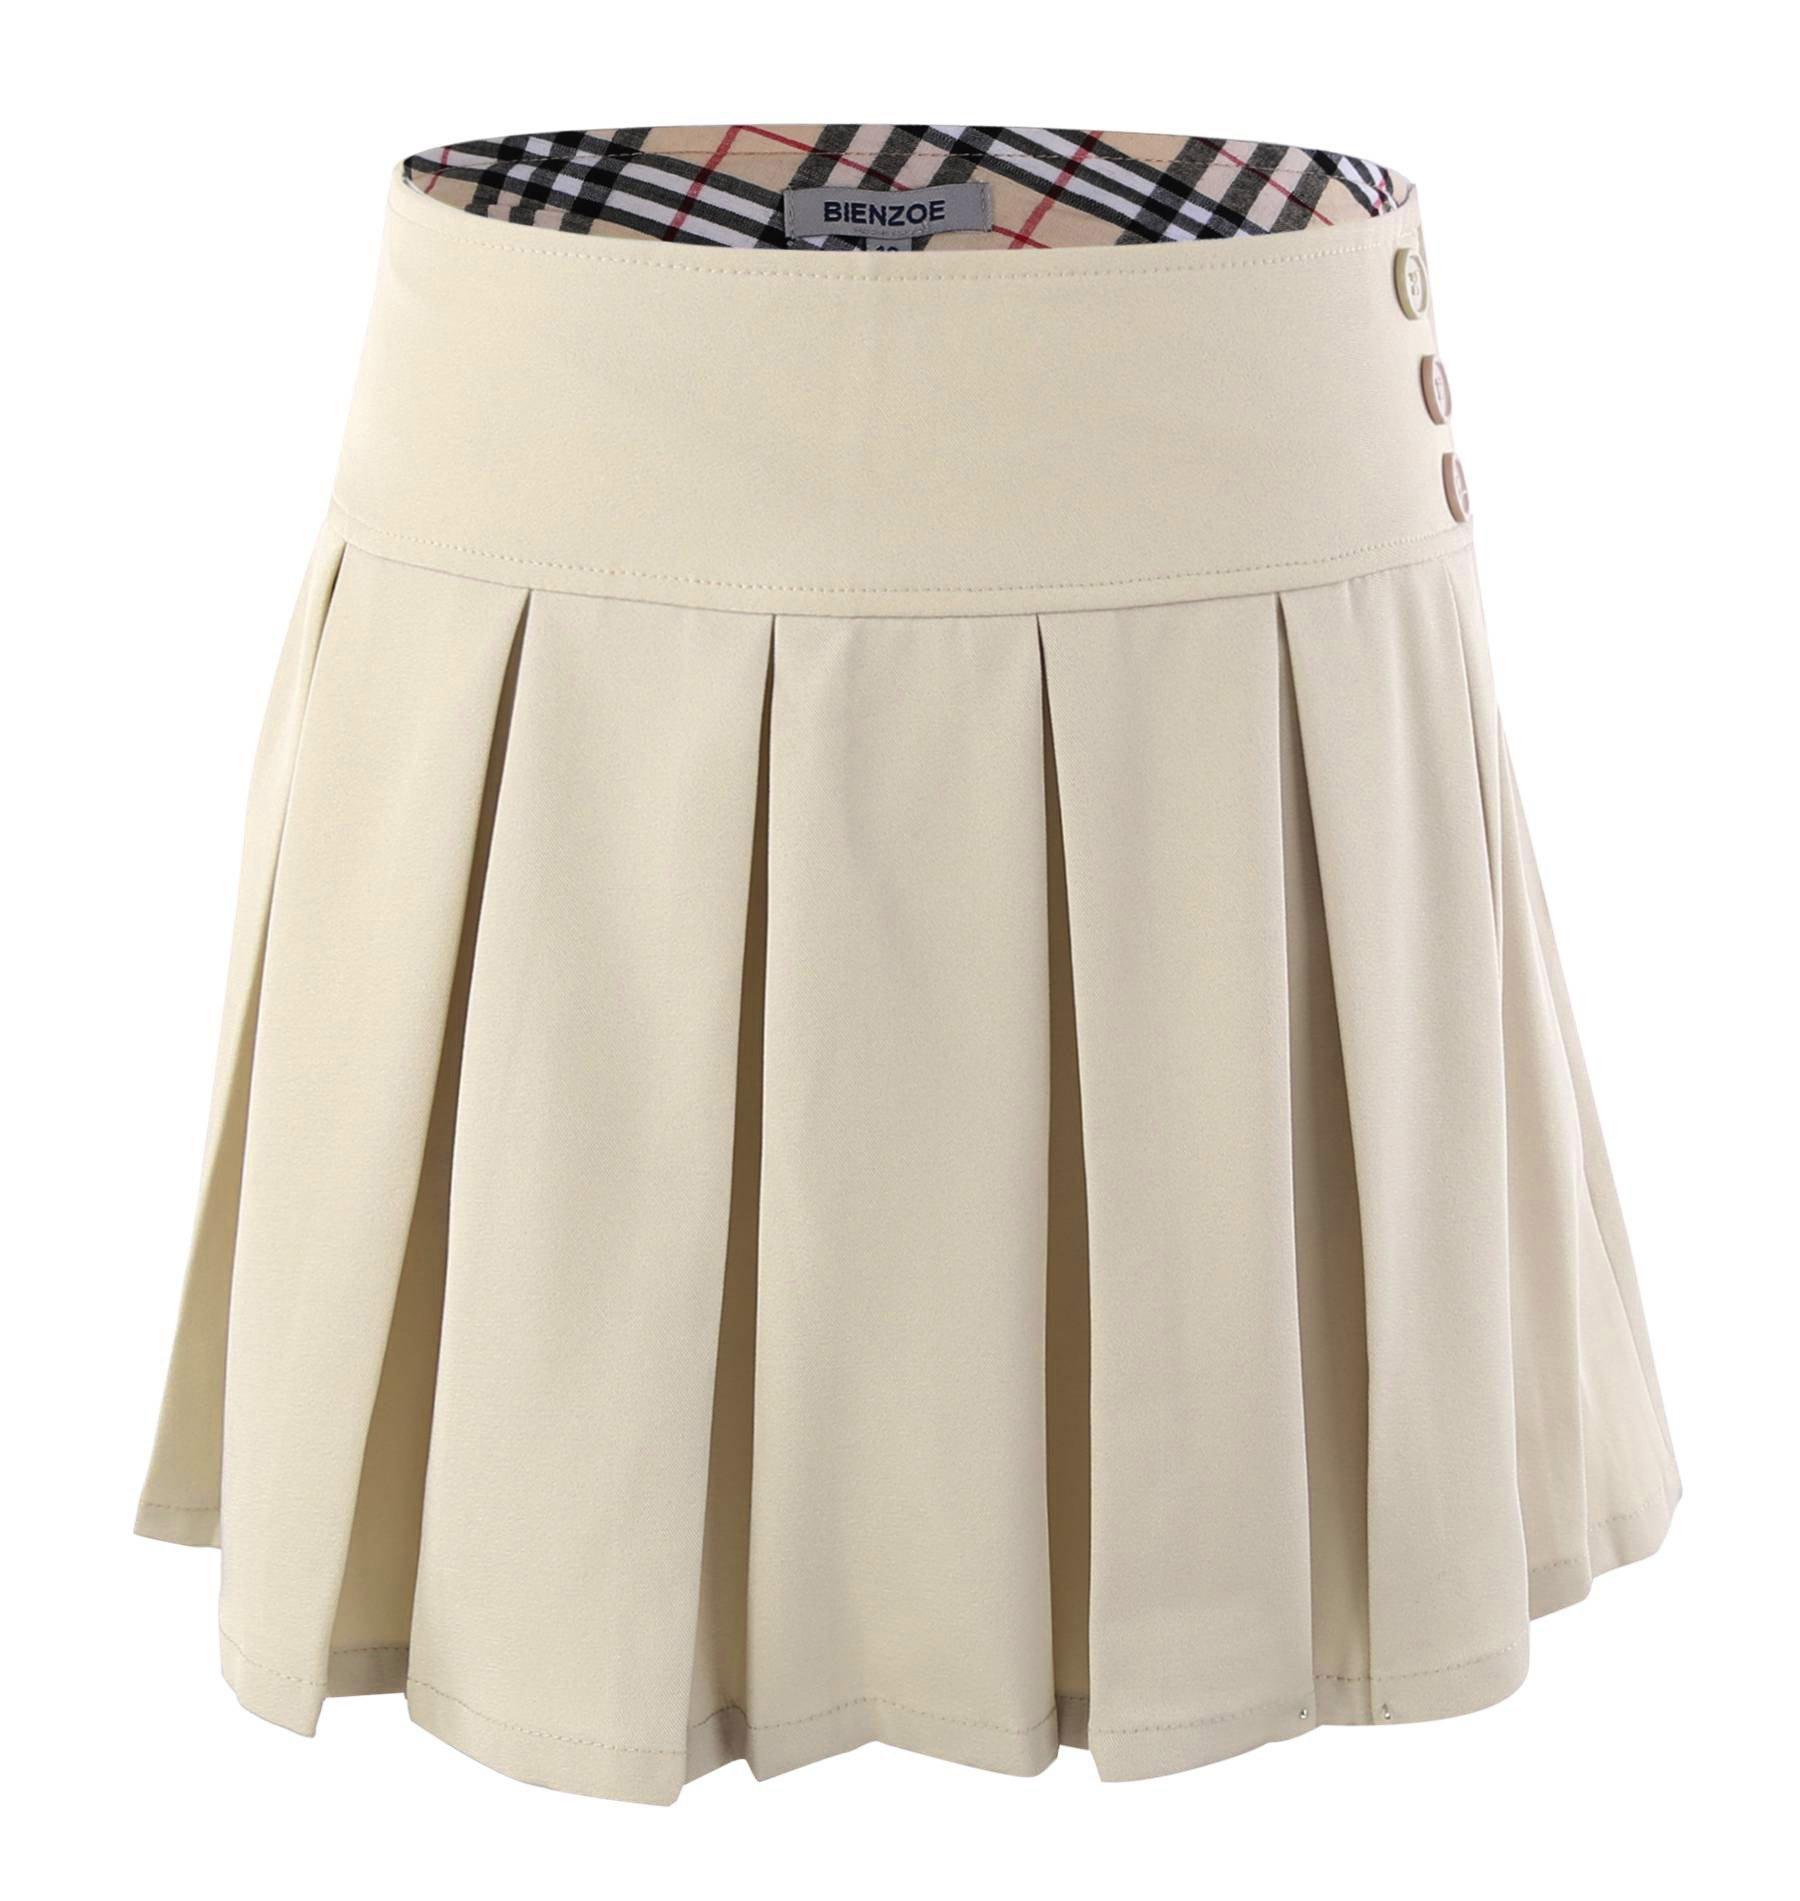 Bienzoe Girl's Stretchy Pleated Durable Adjustable Waist School Uniforms Skirt Khaki 10